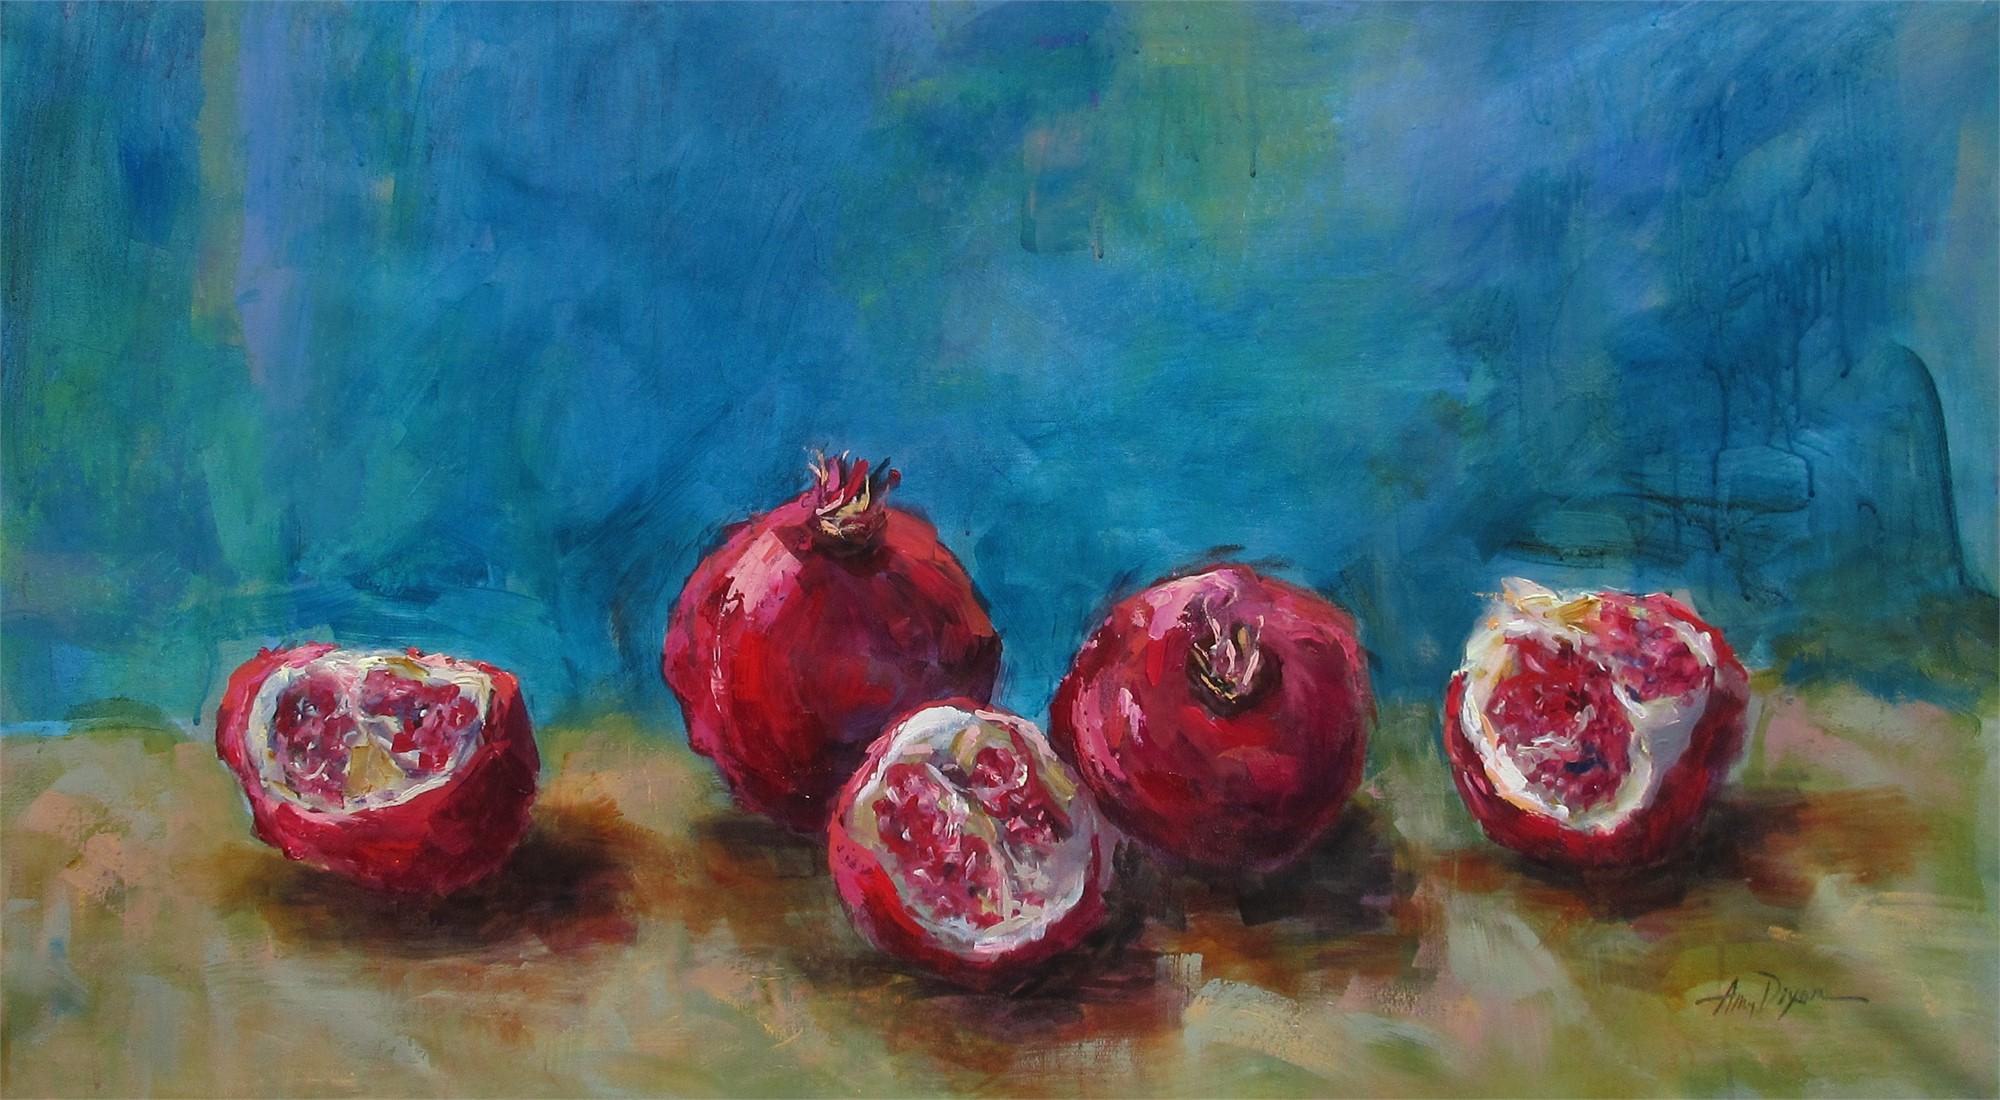 Pomegranate Praise by Amy Dixon